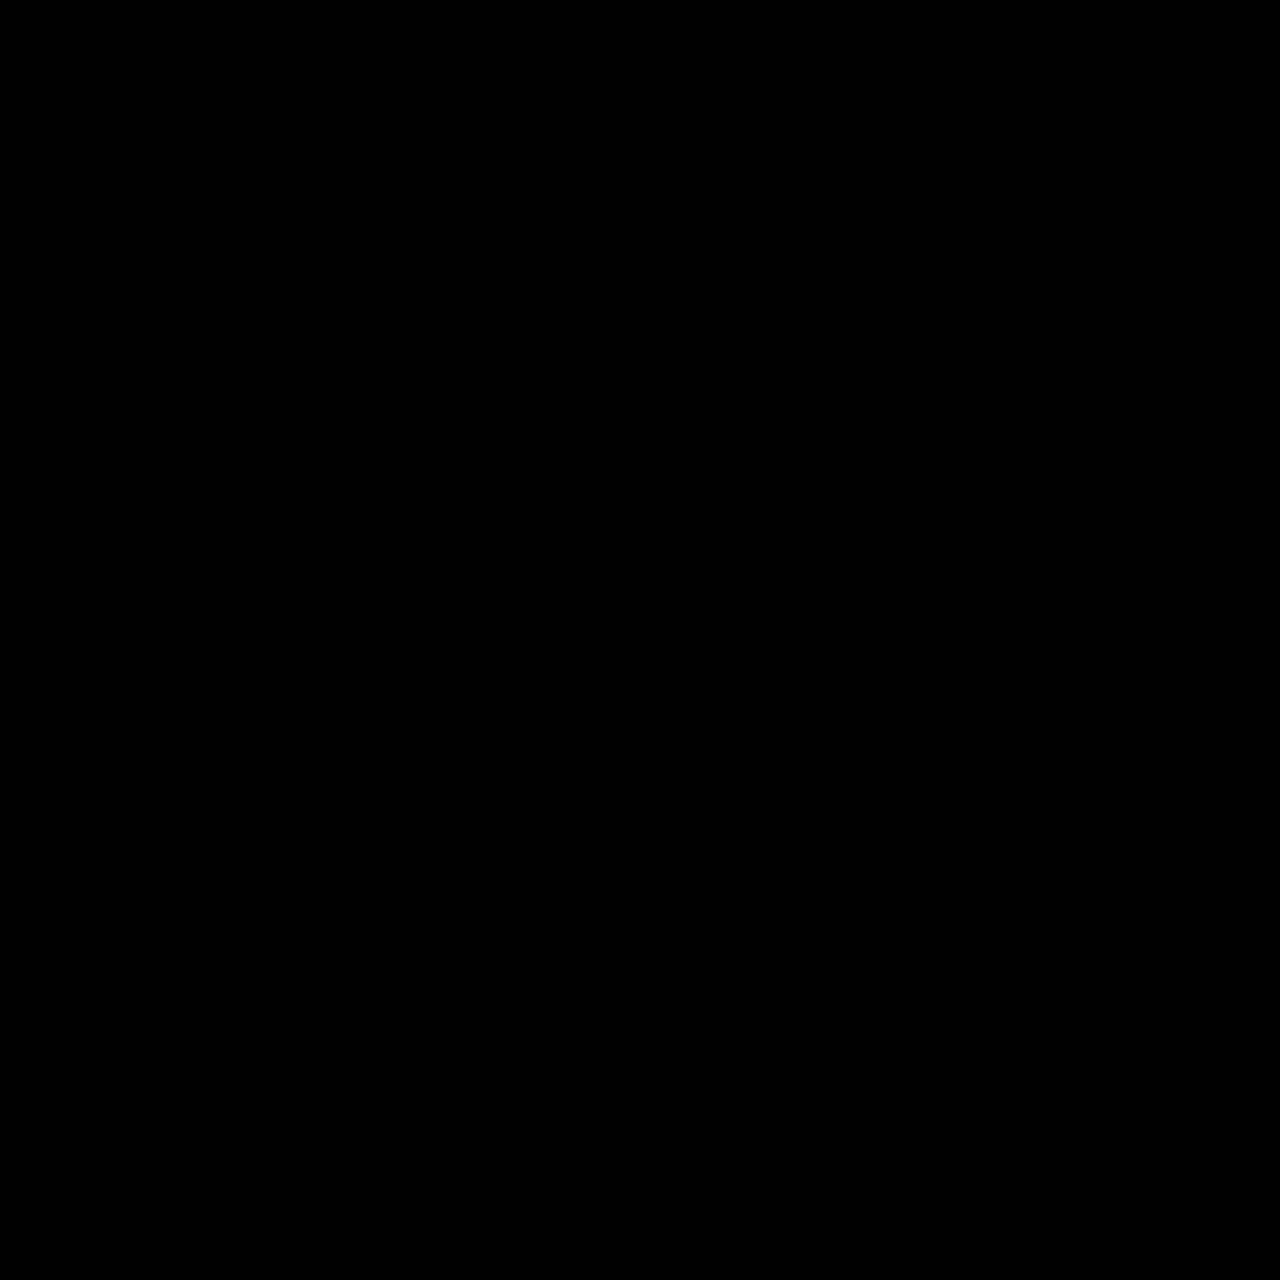 power-black-50x50